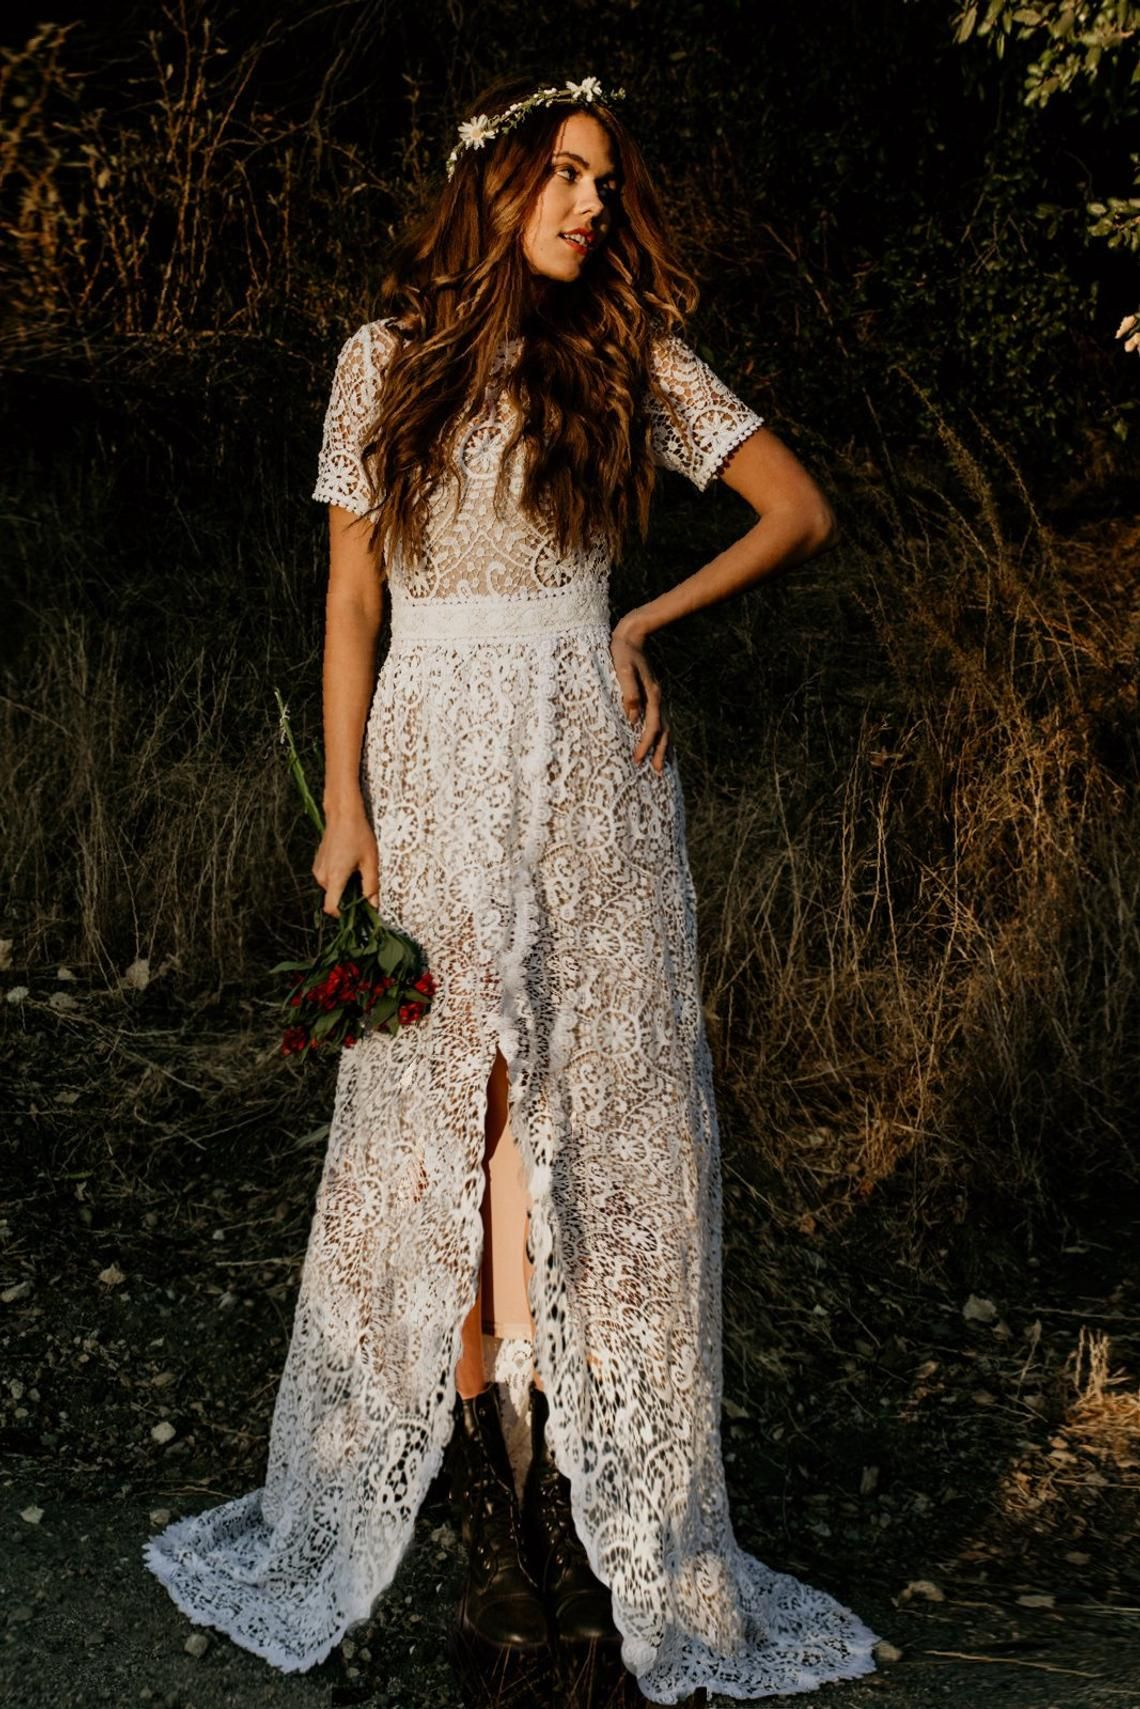 Crochet Lace Short Sleeve High Low Skirt Wedding Maxi Dress Etsy Crochet Lace Dress Bohemian Wedding Dress Lace Lace Dress [ 1709 x 1140 Pixel ]